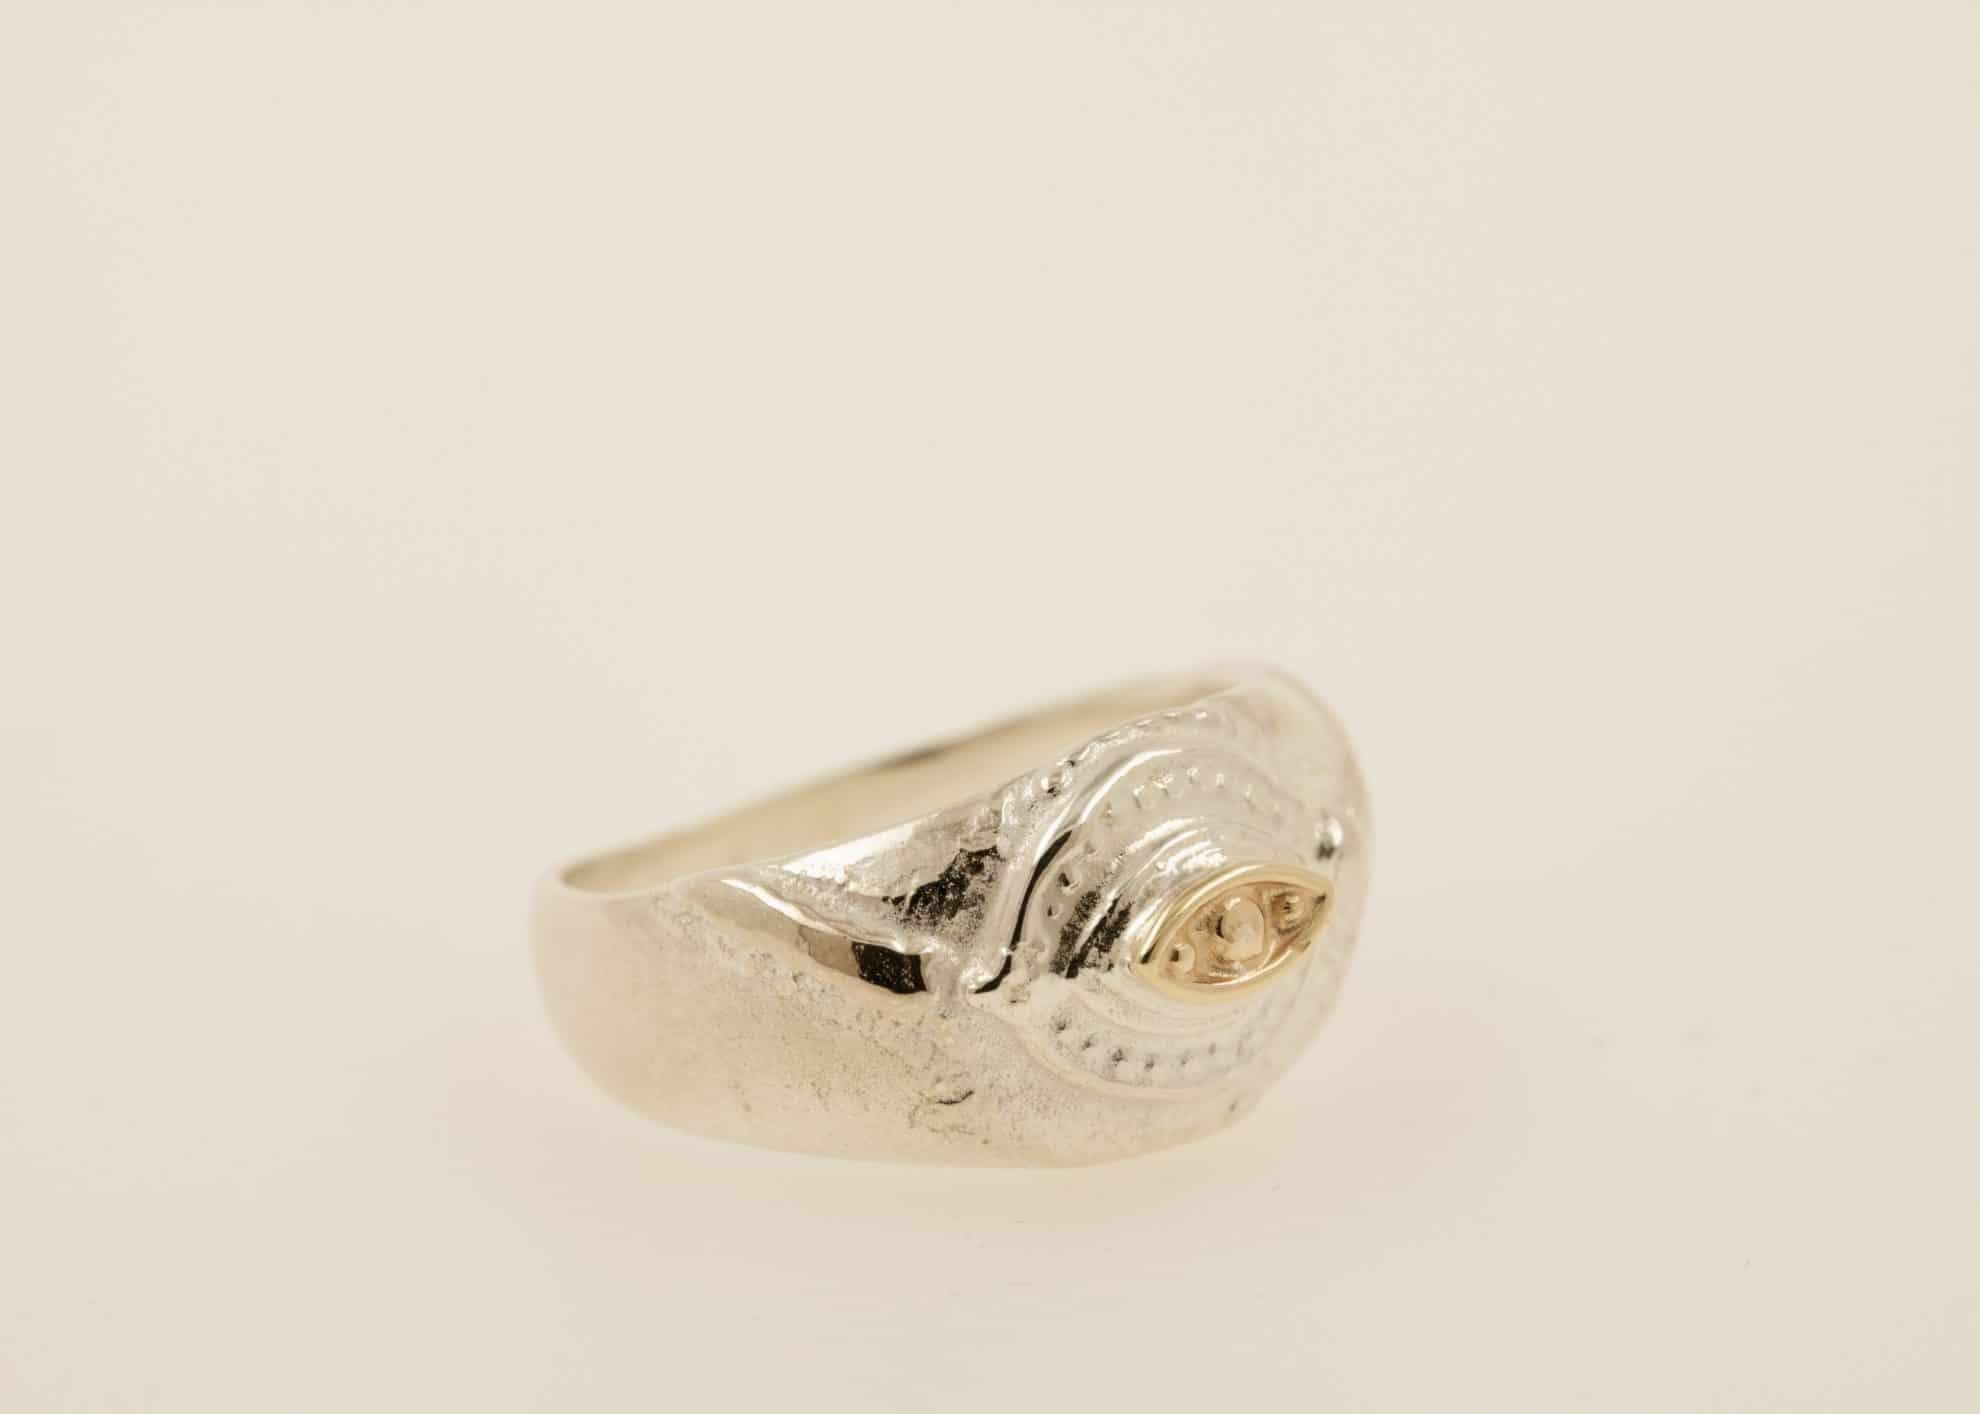 Sterling silver, 14kt gold